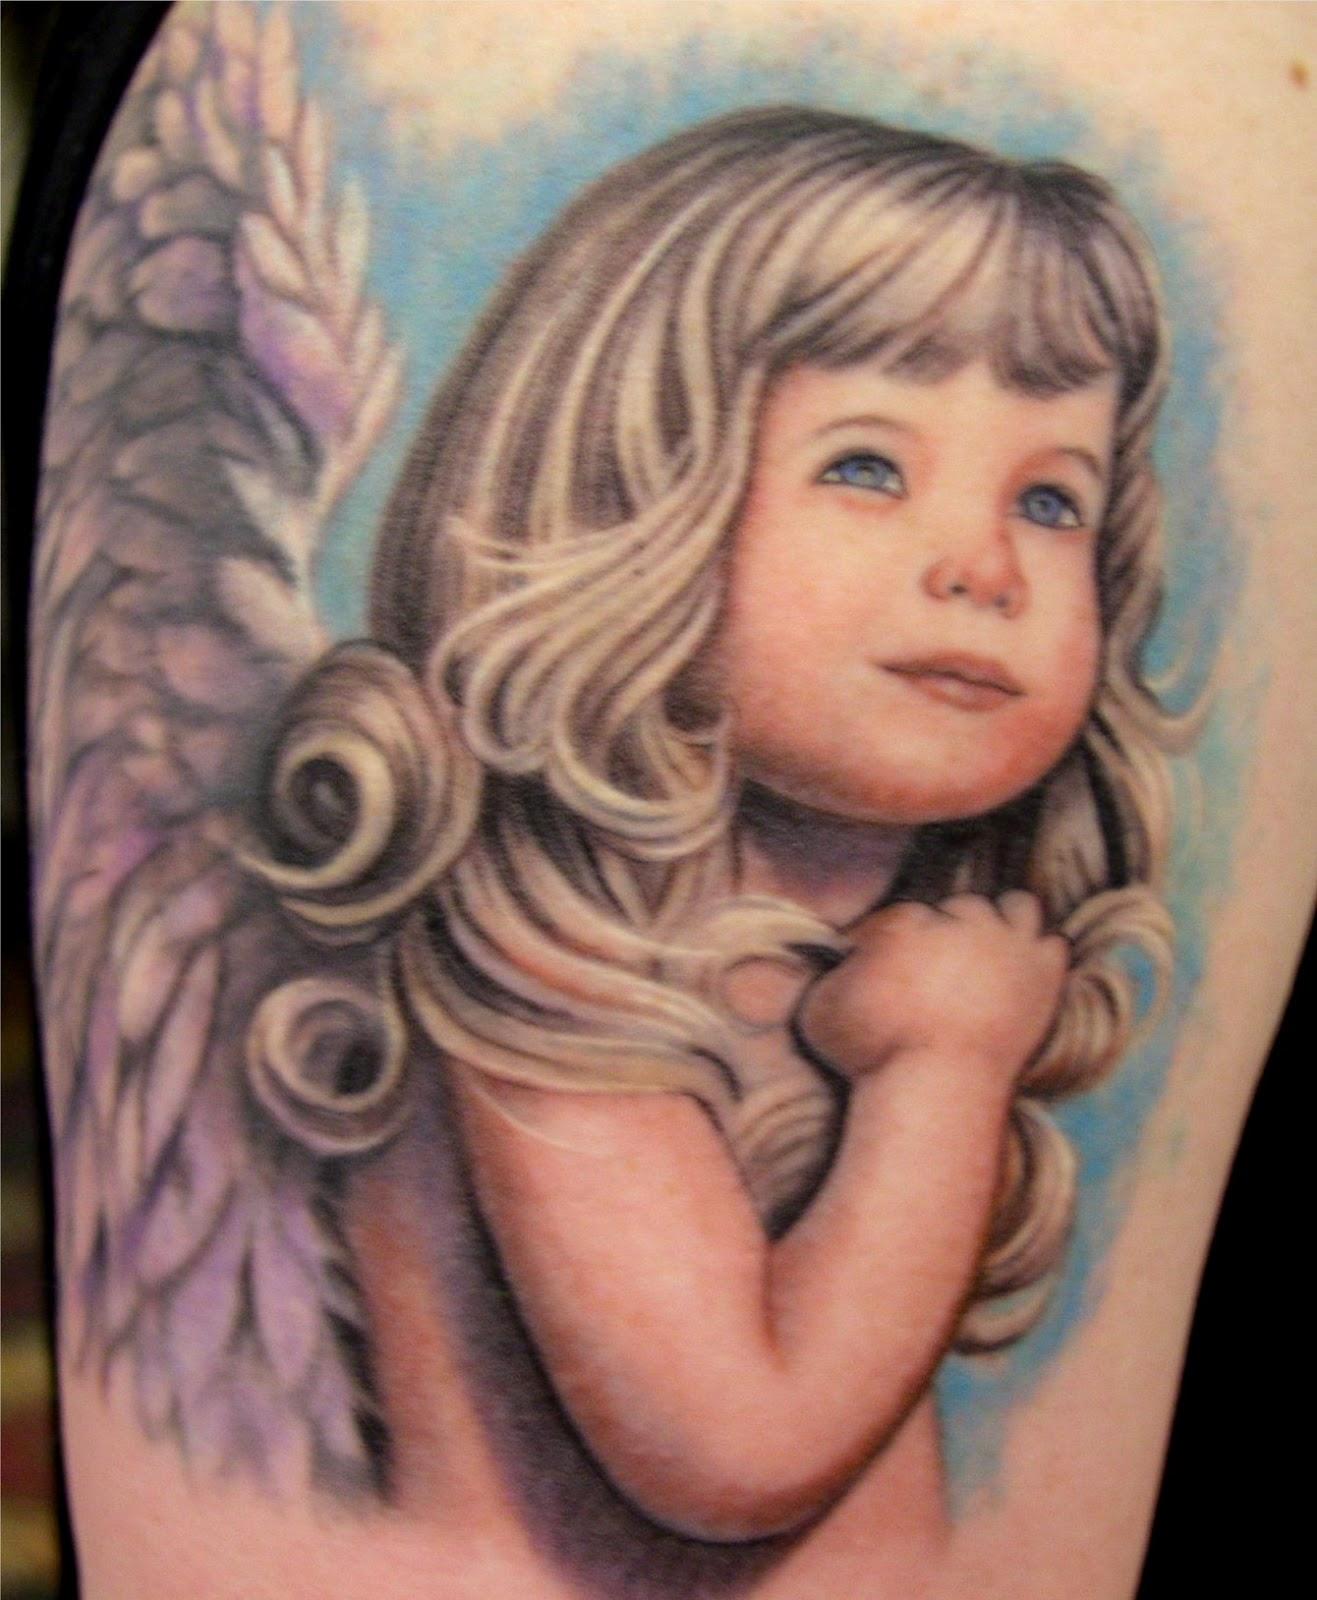 Tattoo Ideas For Women Arm: Tumblr Tattoo: Tattoos For Men On Forearm Designs